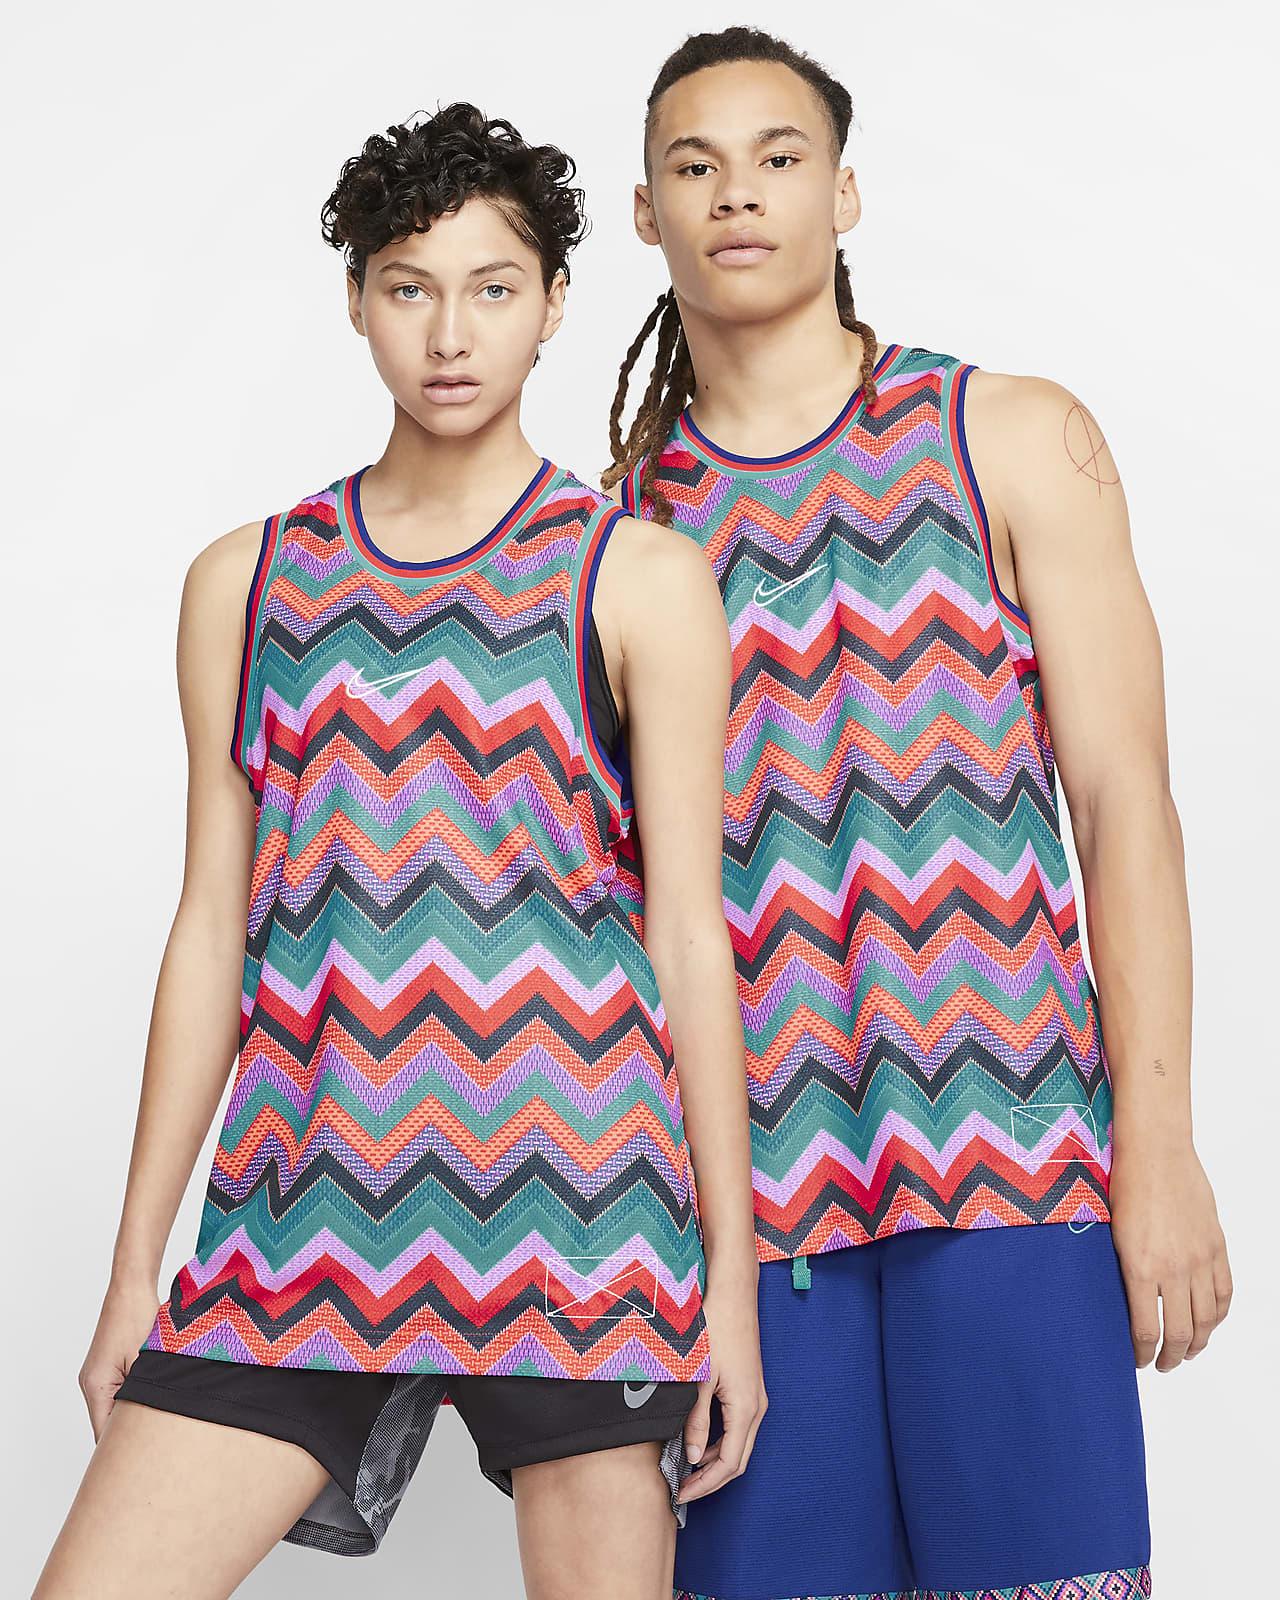 Nike Dri-FIT Basketballtrikot